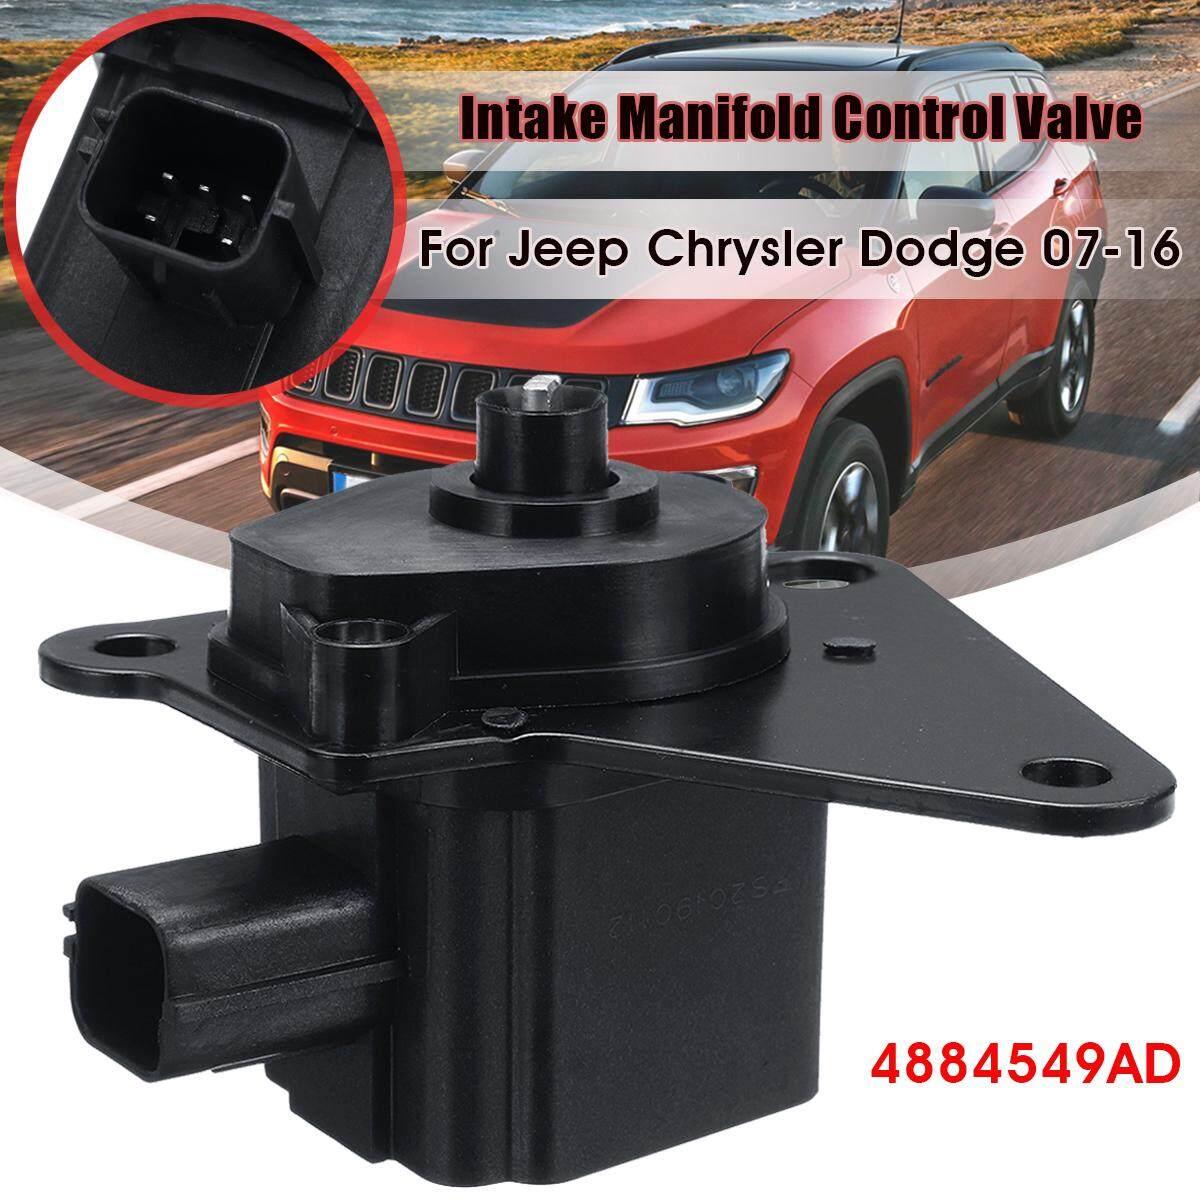 4884549ad Intake Manifold Runner Katup Kontrol Untuk Jeep Chrysler Dodge 2.0 2.4 By Autoleader